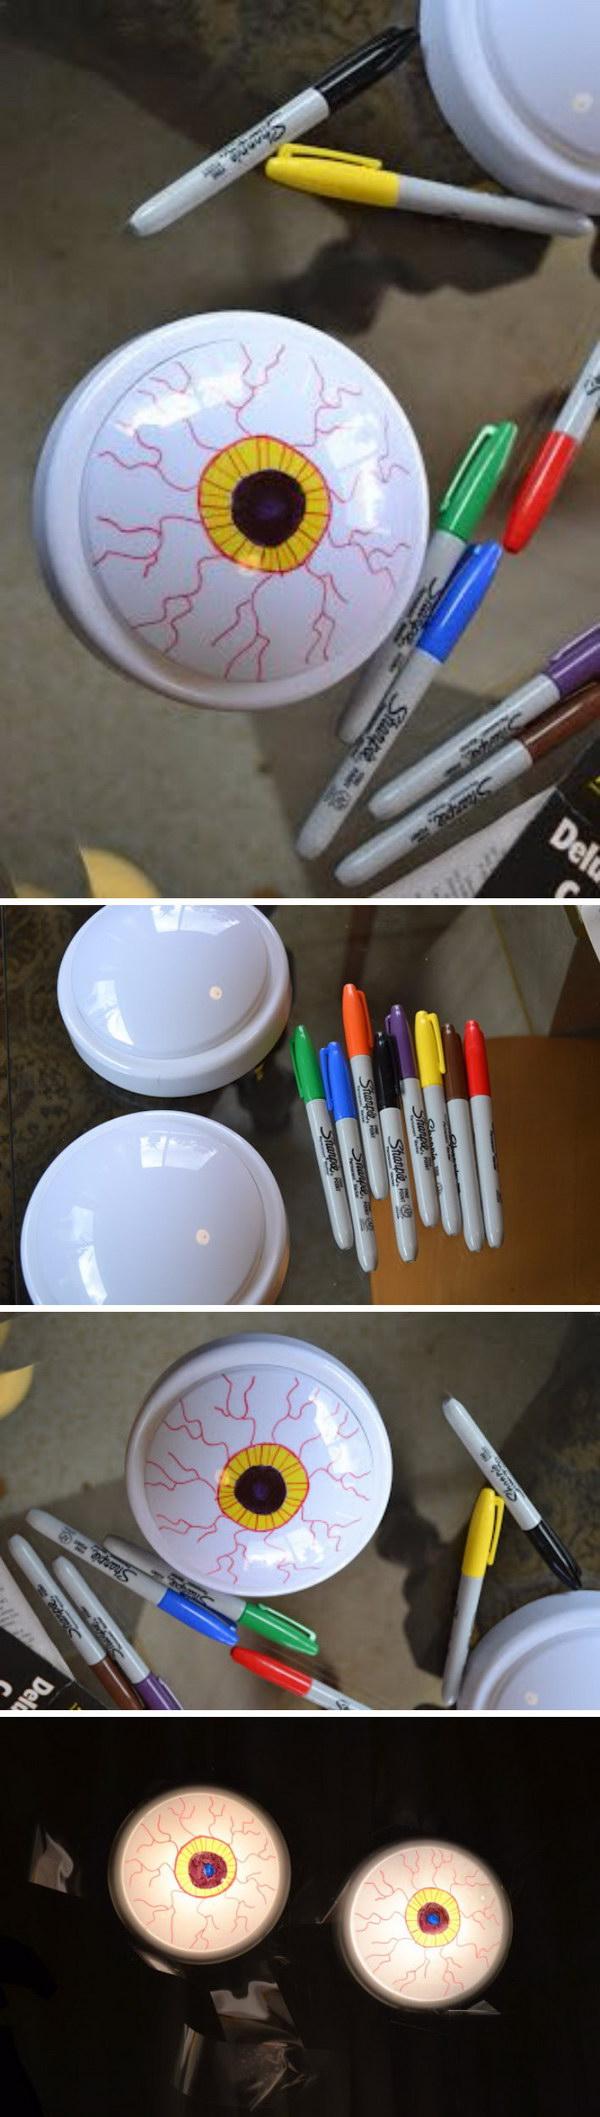 Turning Cheap Battery-Powered Lights Into Creepy Eyeballs.